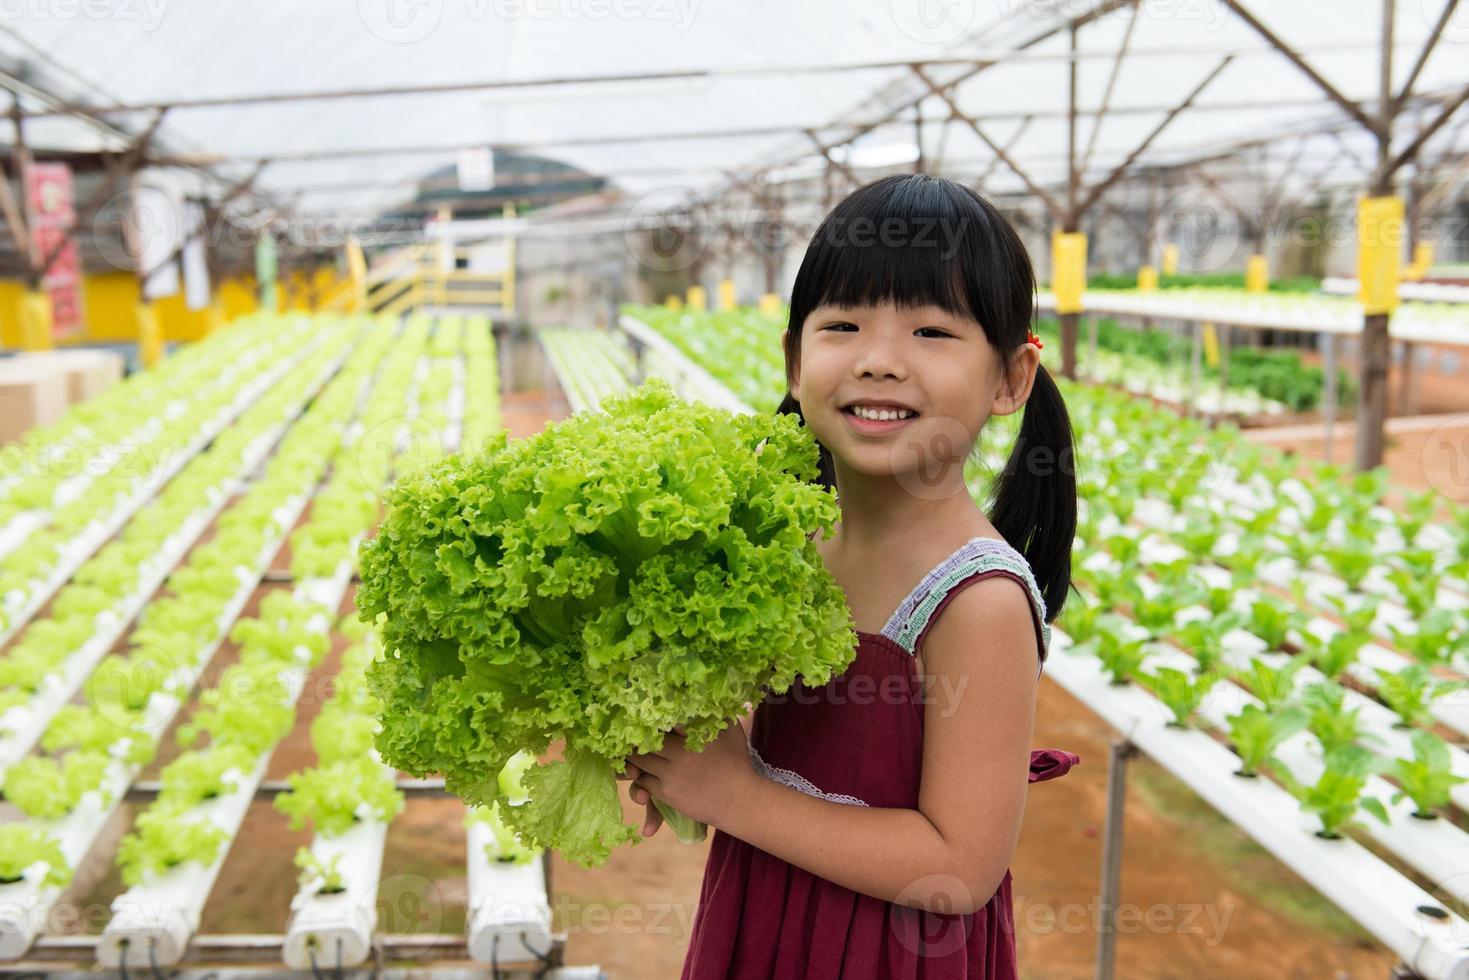 vegetal de exploração infantil foto